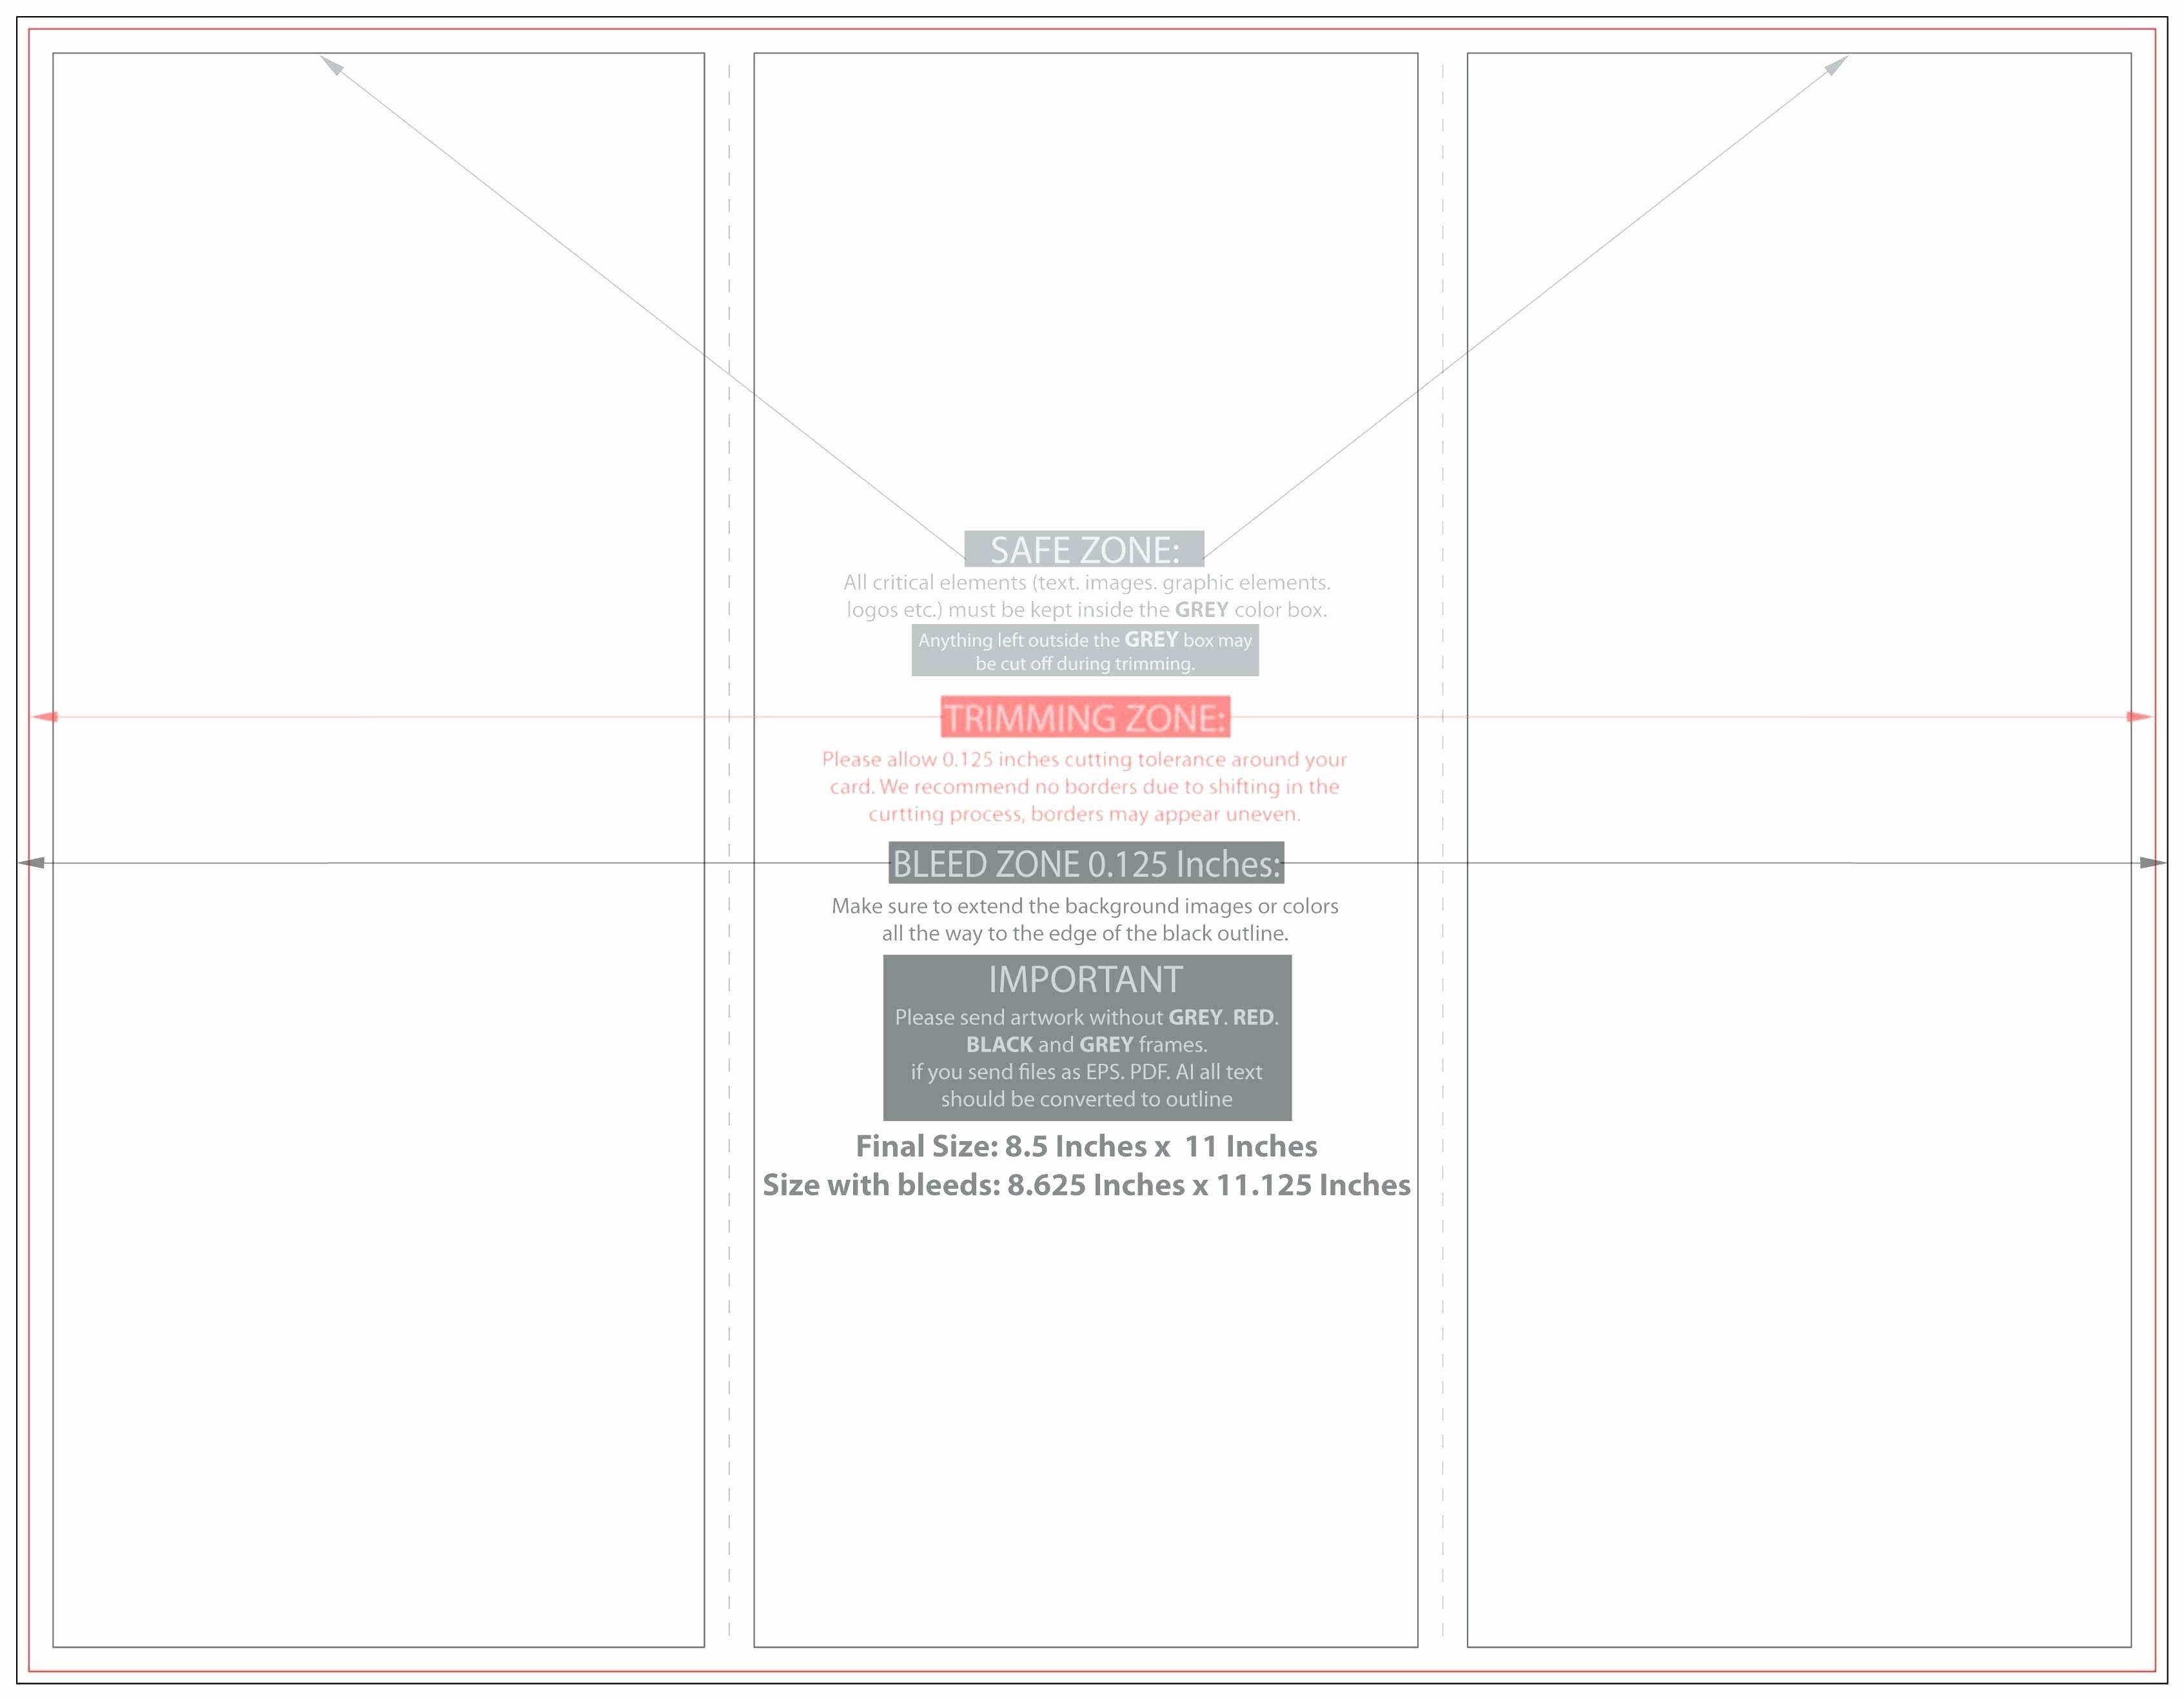 008 Shocking Quarter Fold Greeting Card Template Word Photo Full